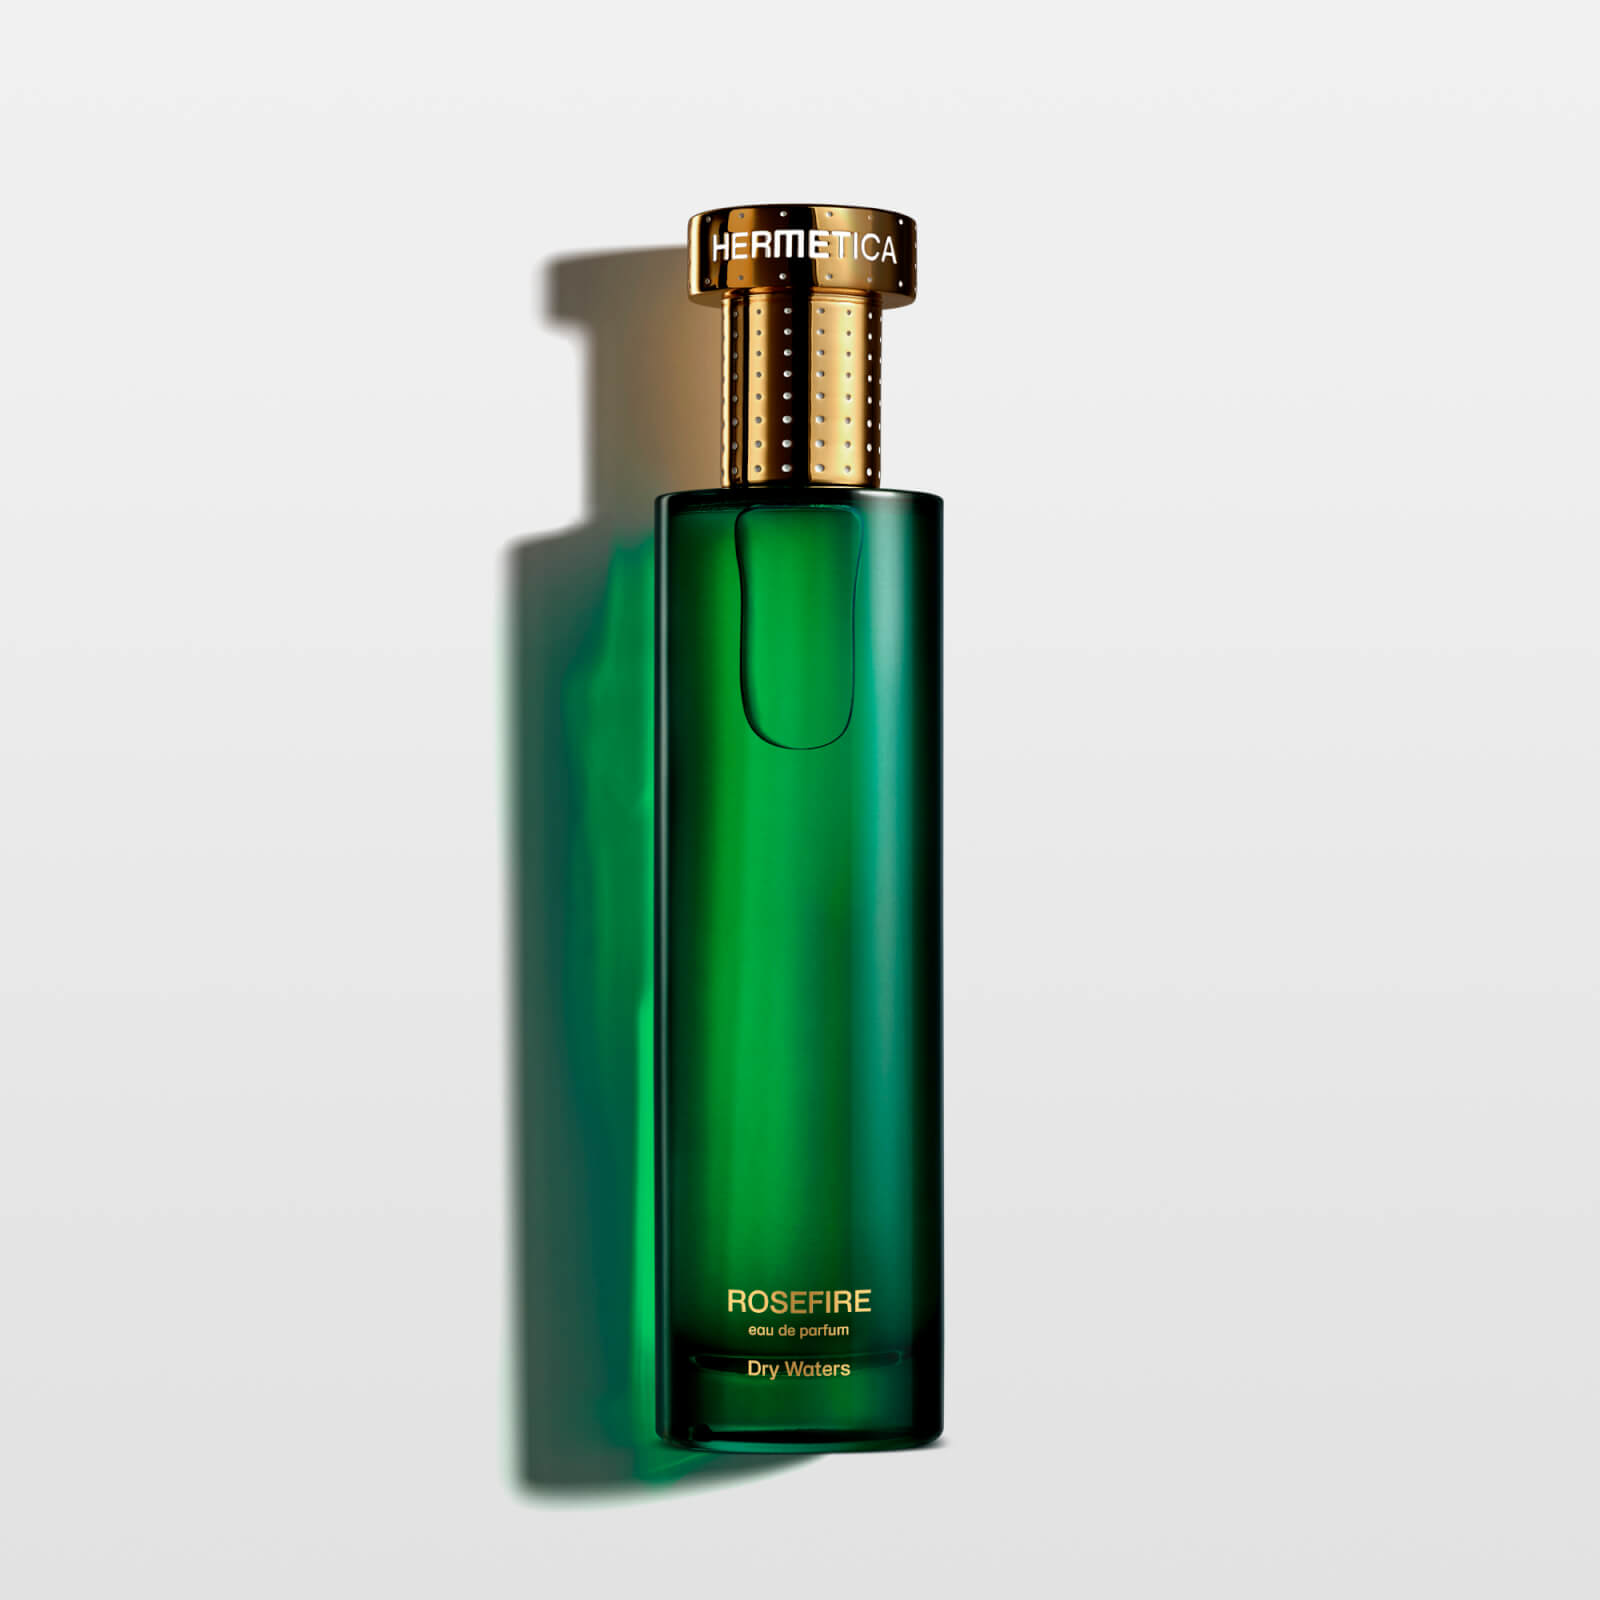 Hermetica Rosefire Eau de Parfum 100ml